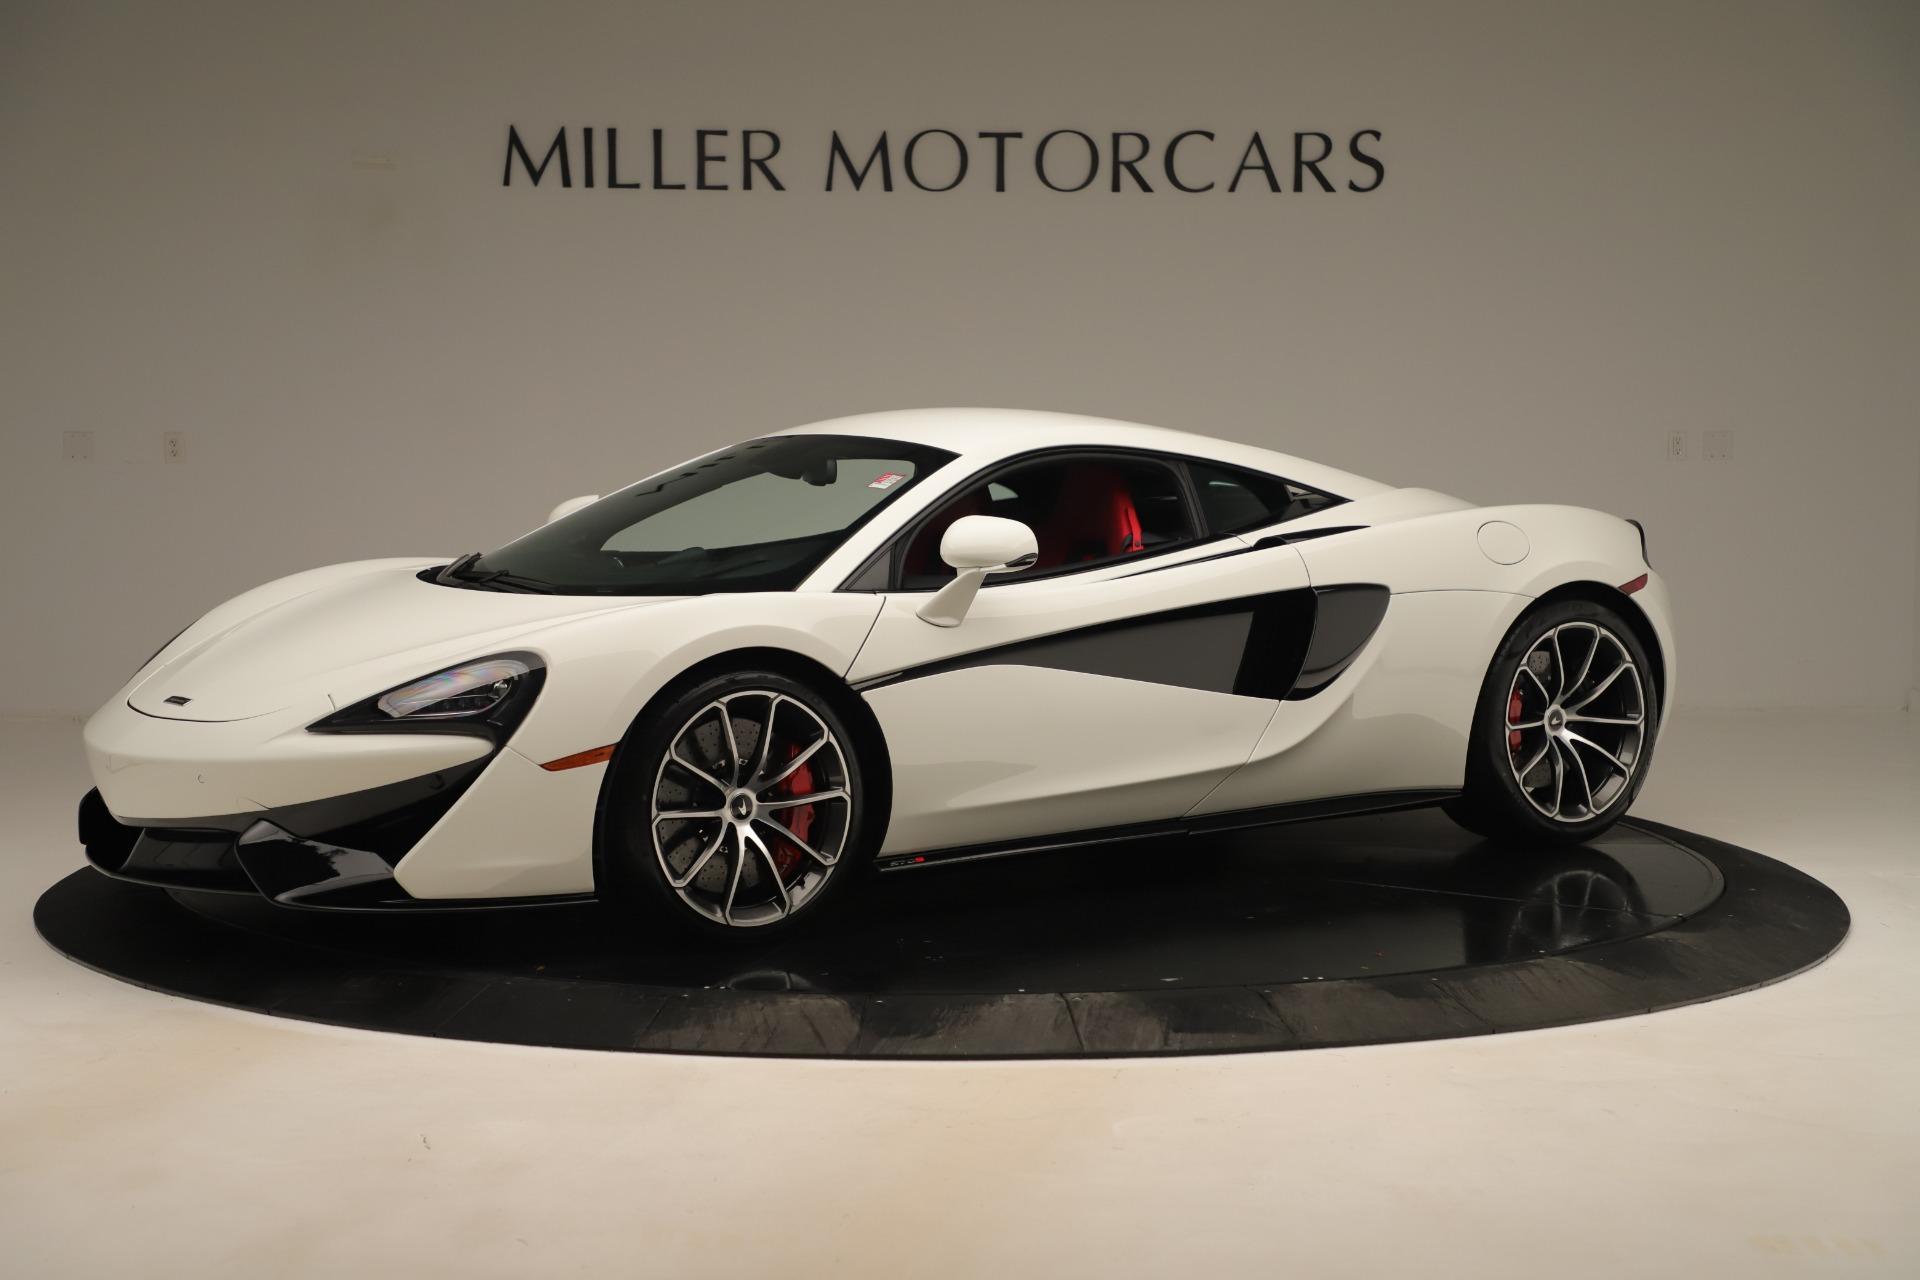 New 2020 McLaren 570S for sale $215,600 at Bugatti of Greenwich in Greenwich CT 06830 1